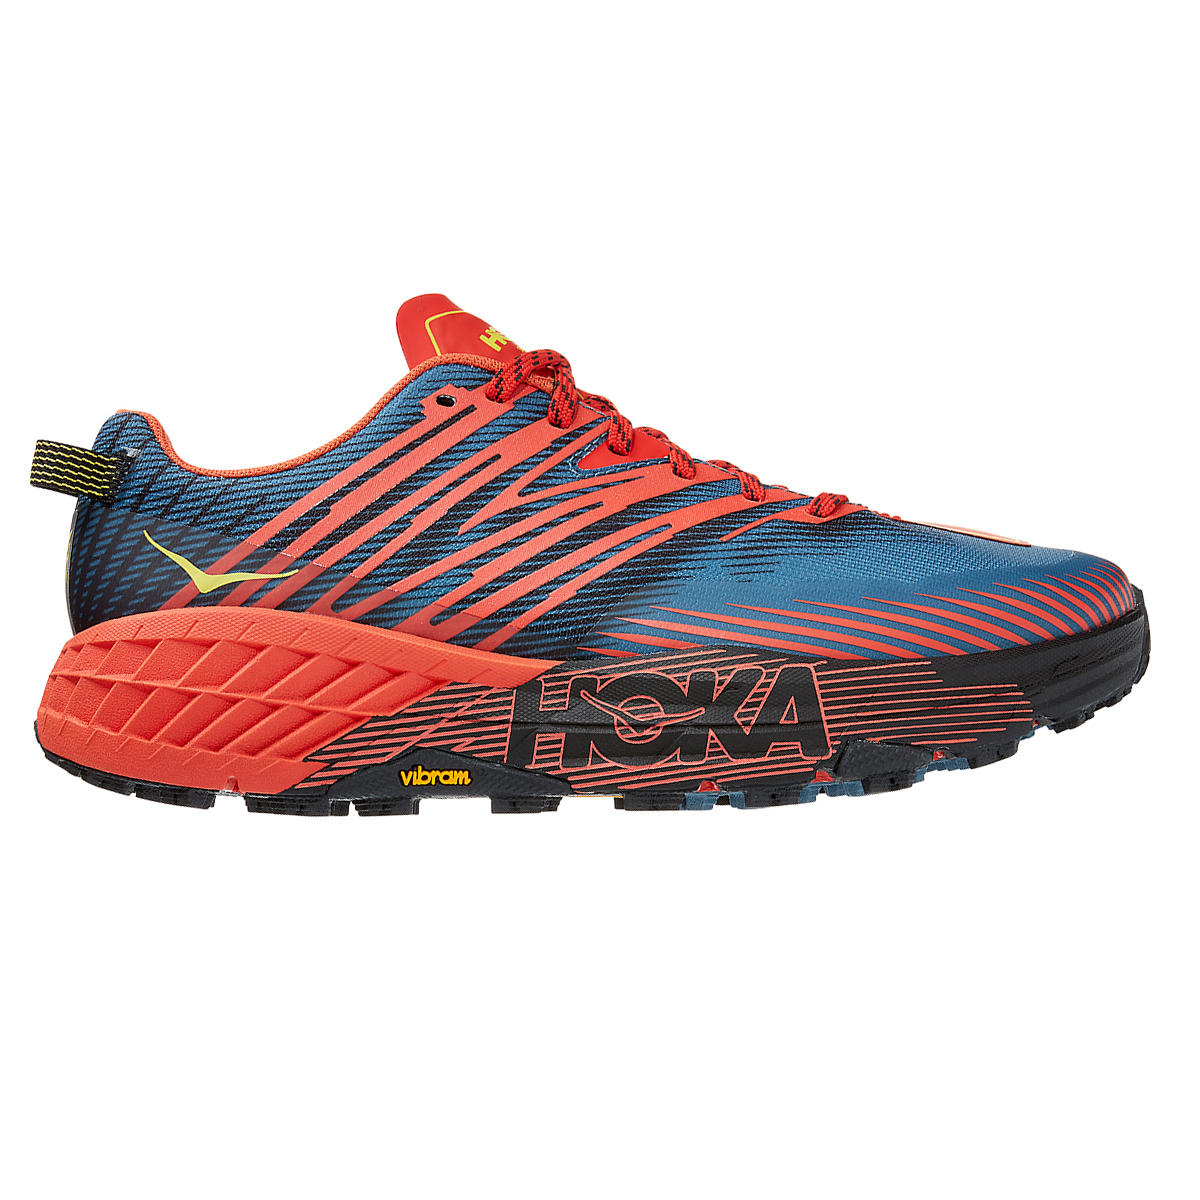 Men's Hoka One One Speedgoat 4 Trail Running Shoe, , large, image 1